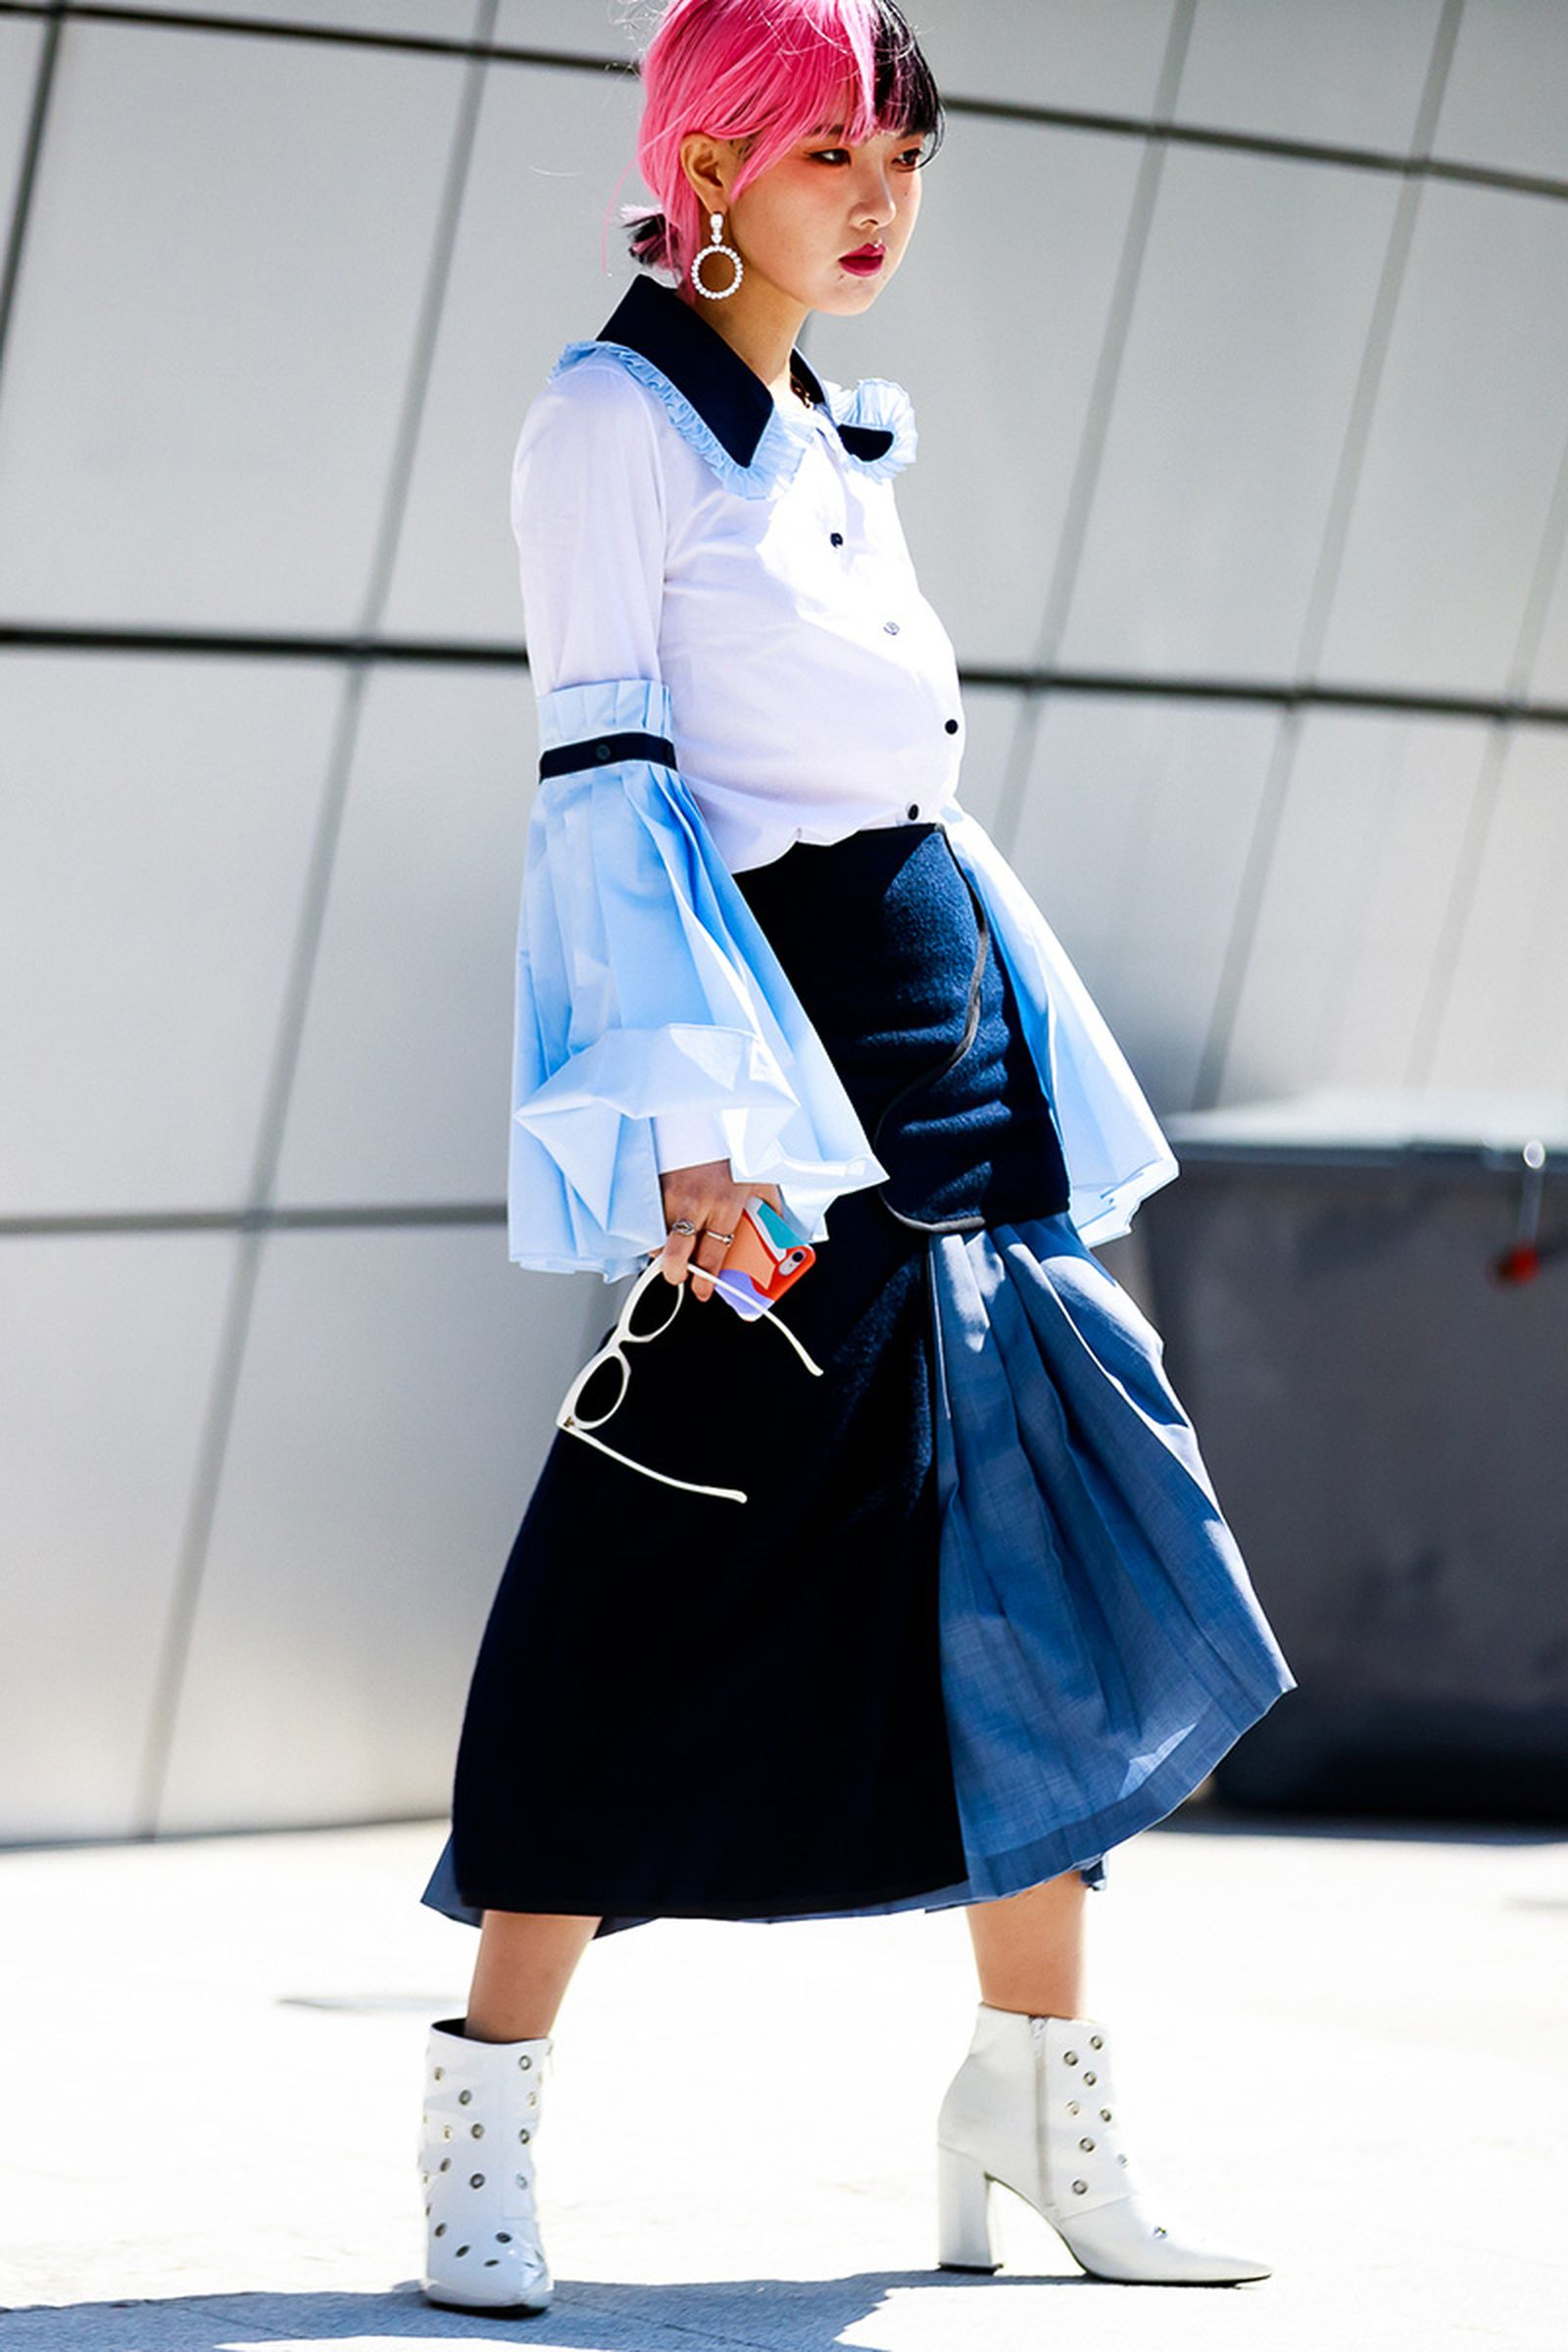 3Seoul street style march paul jeong seoul fashion week